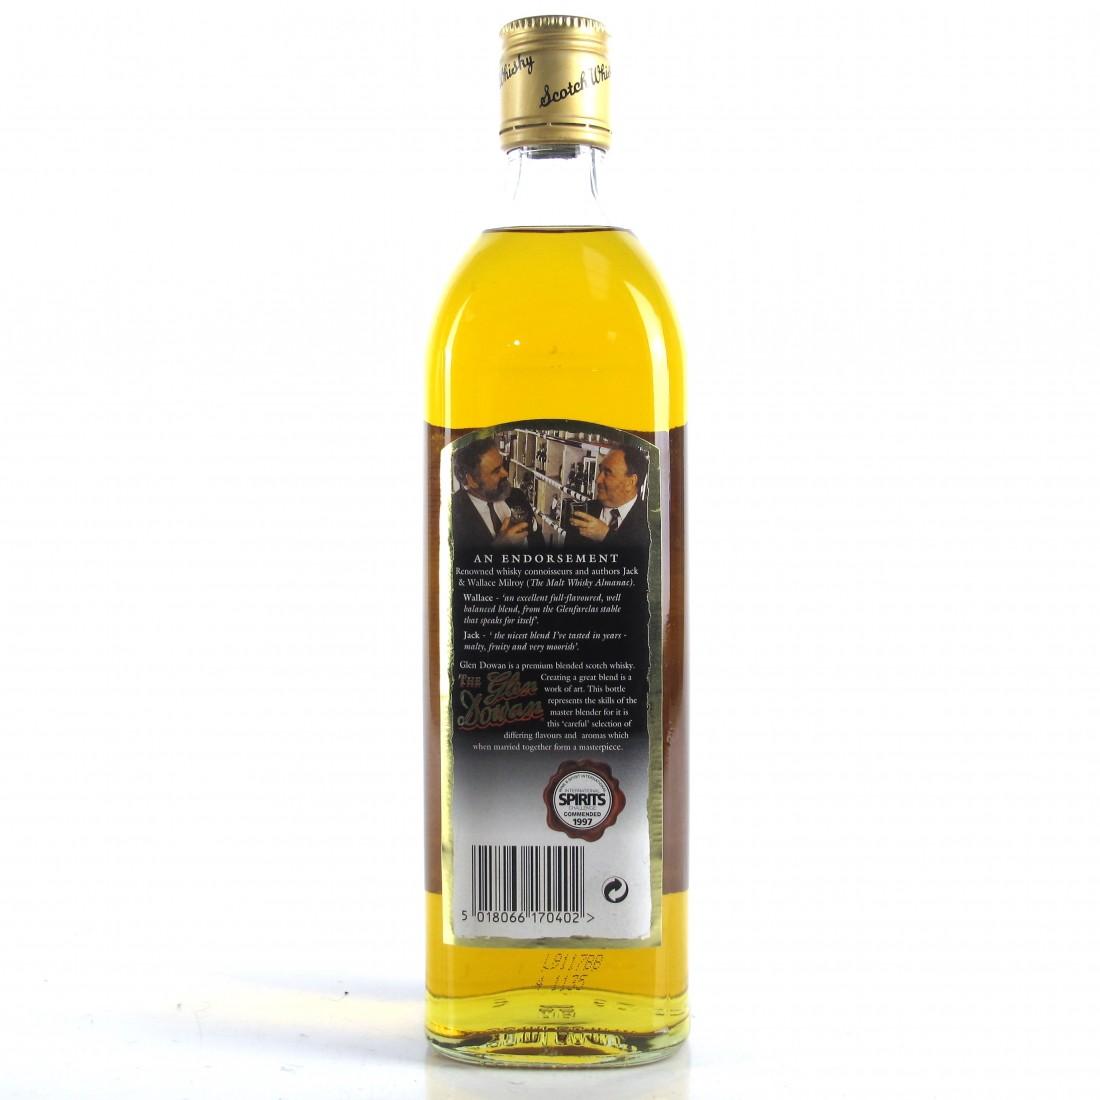 Glen Dowan Scotch Whisky